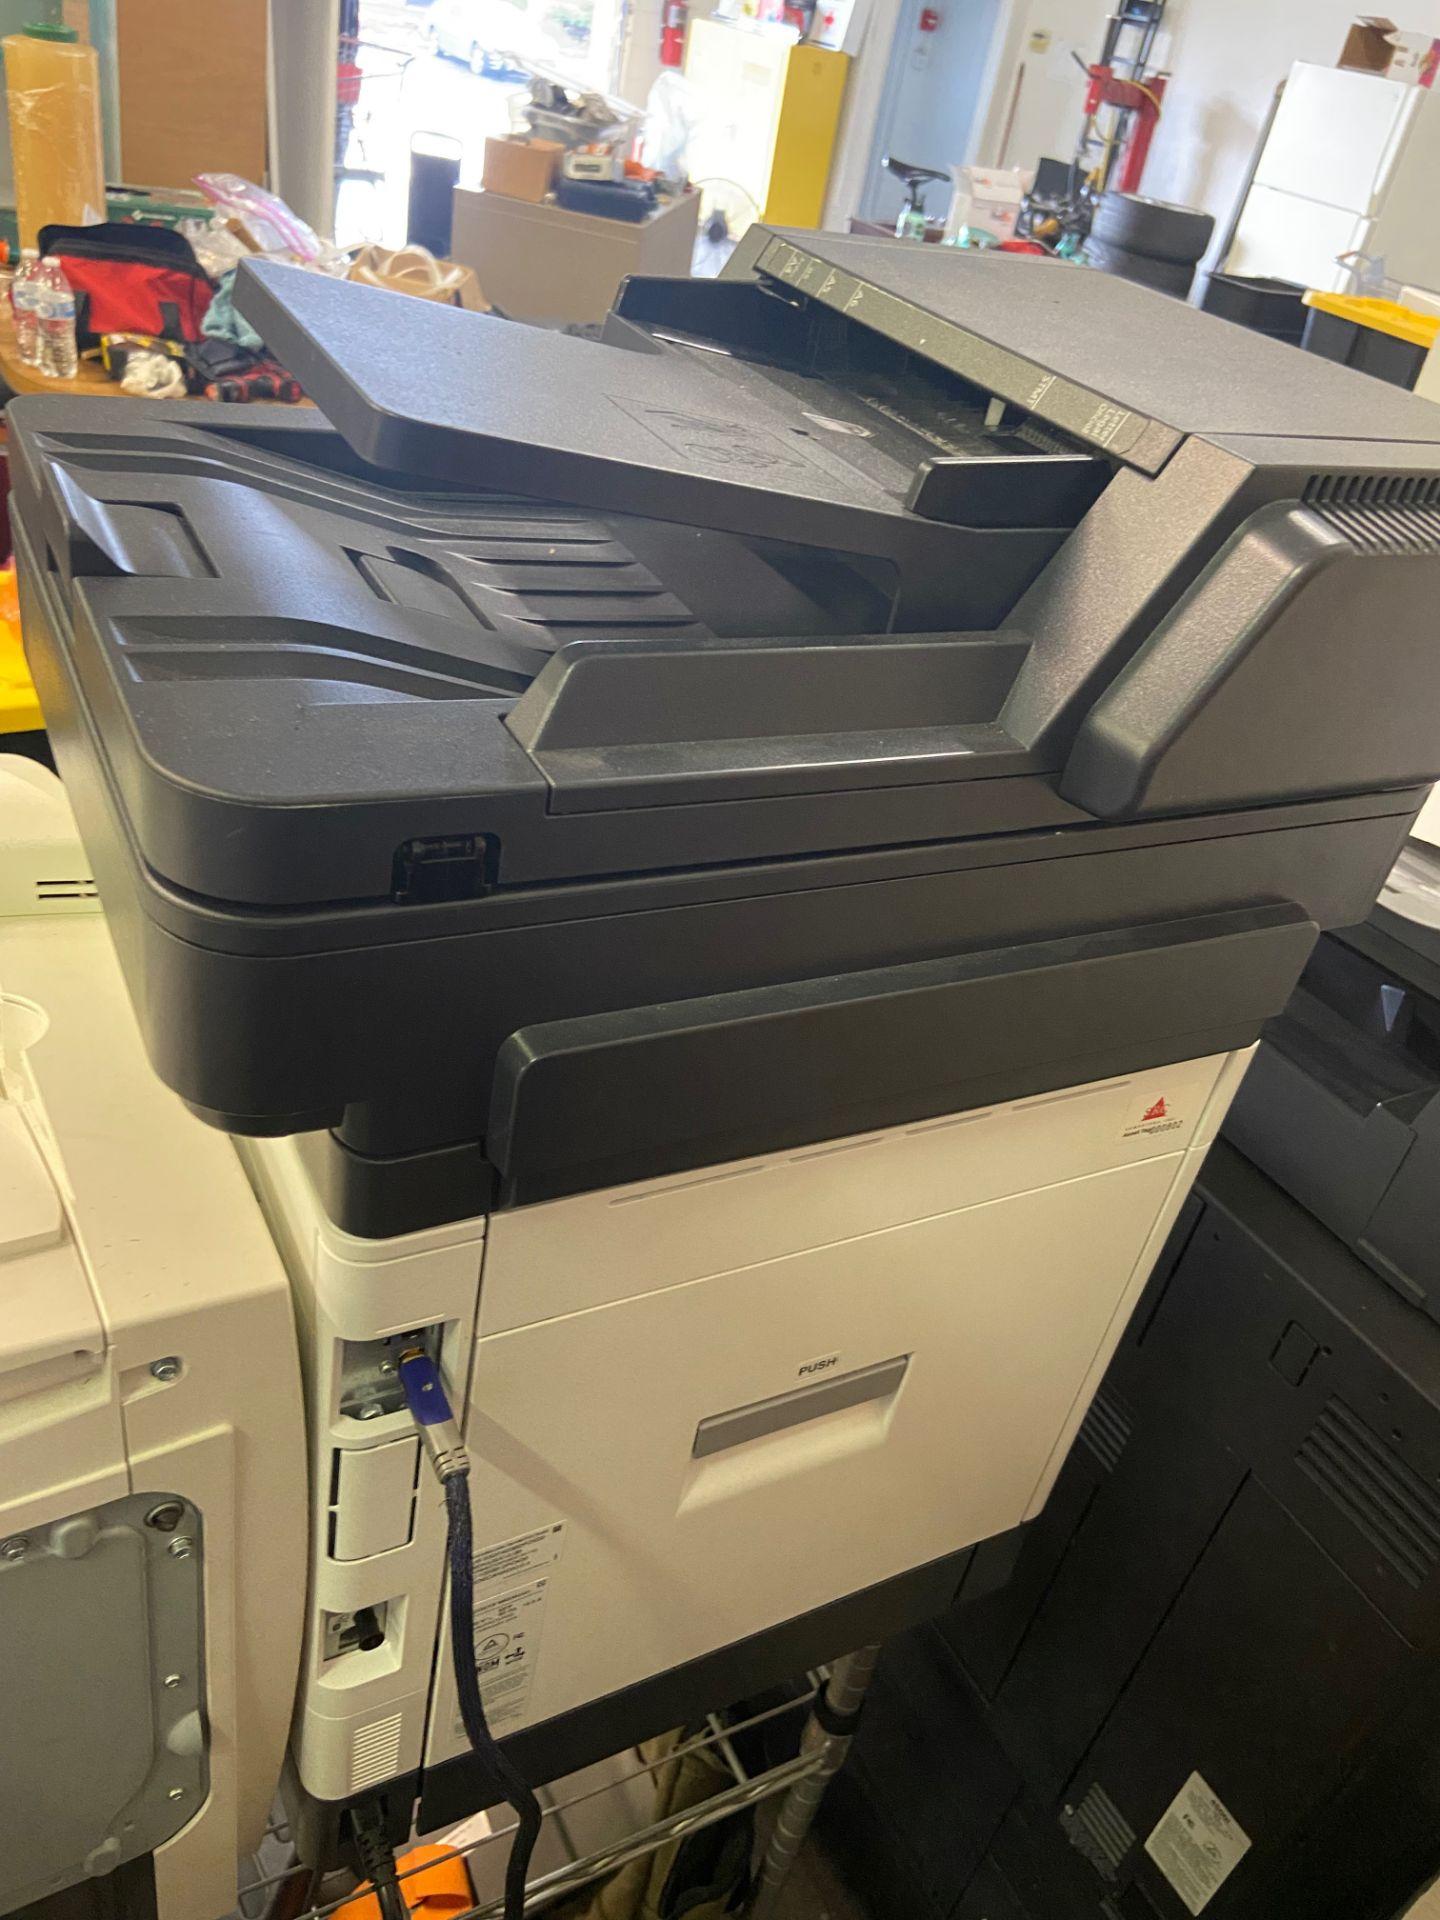 Kyocera Ecosys Printer, Model# M6535cidn, 120V, 60 Hz, Loading/Removal Fee: $20 - Image 4 of 6